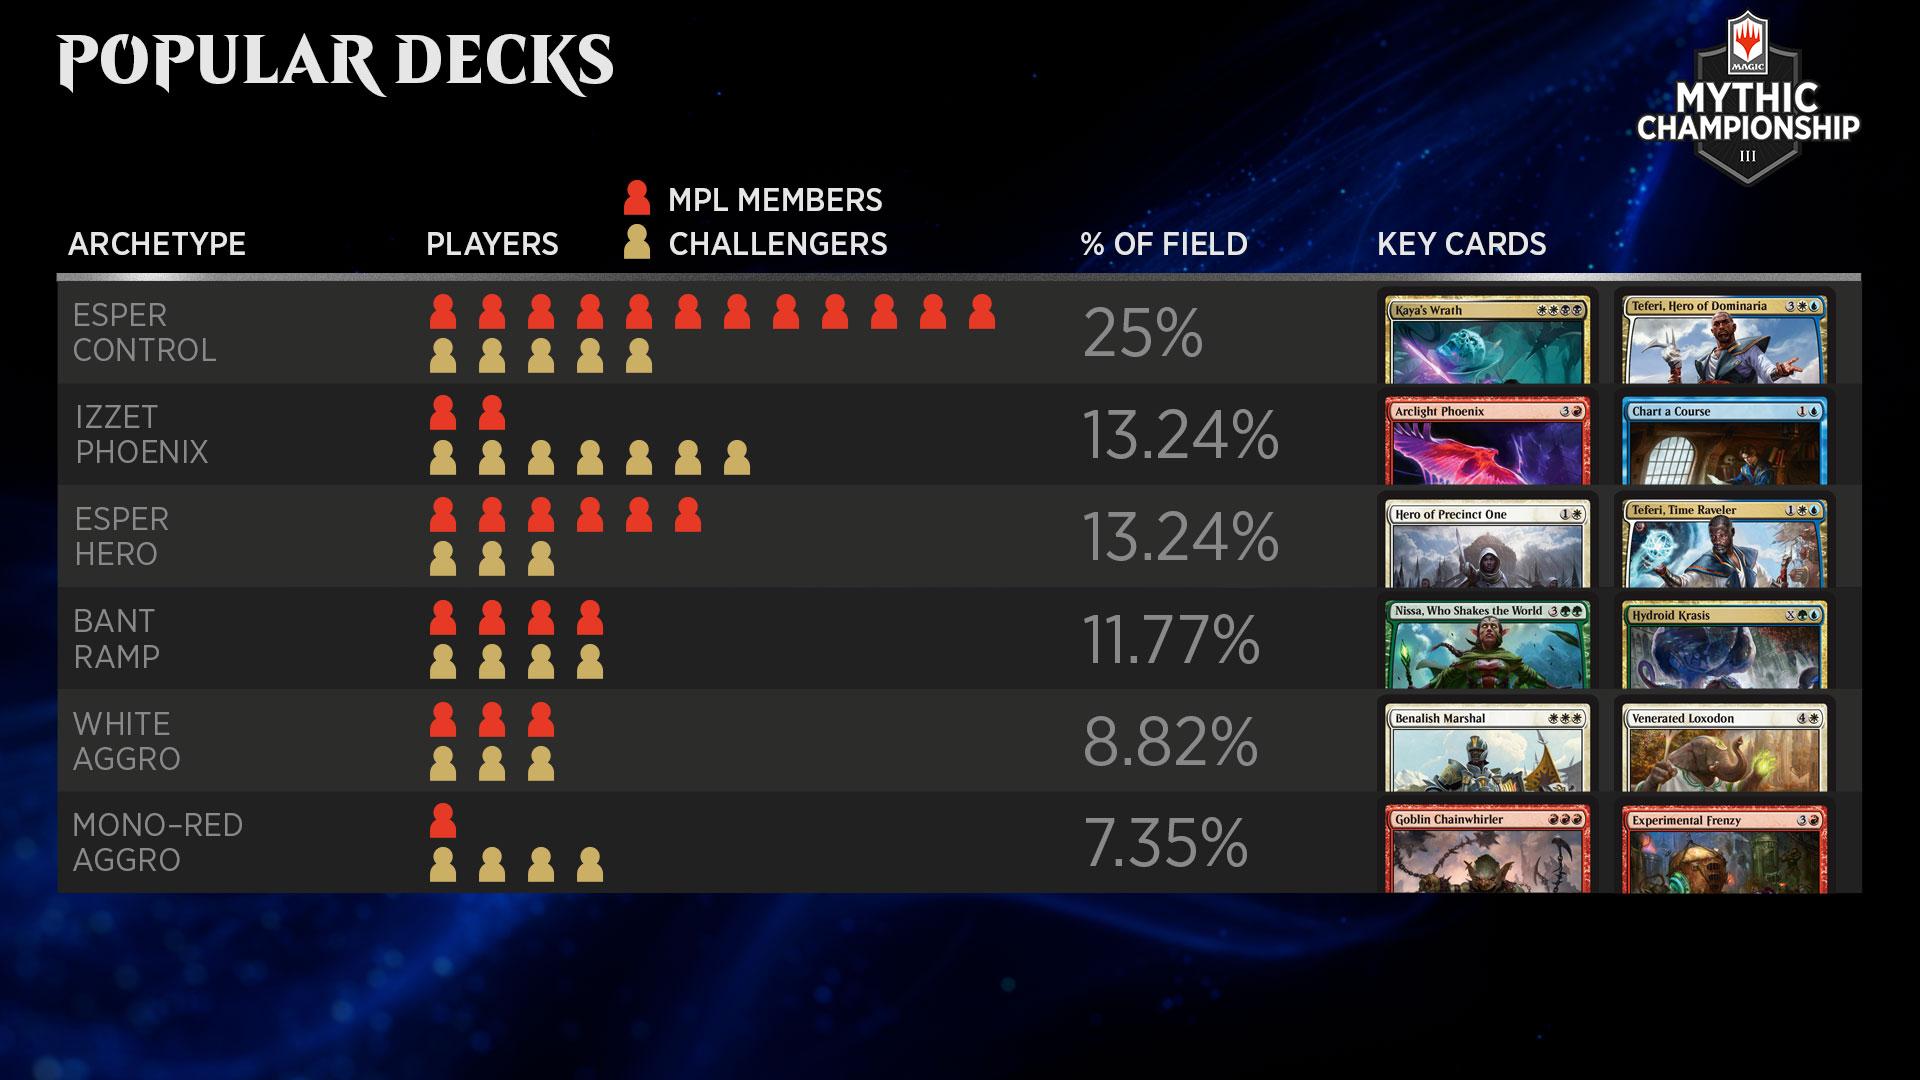 Mythic Championship III 2019, popular decks